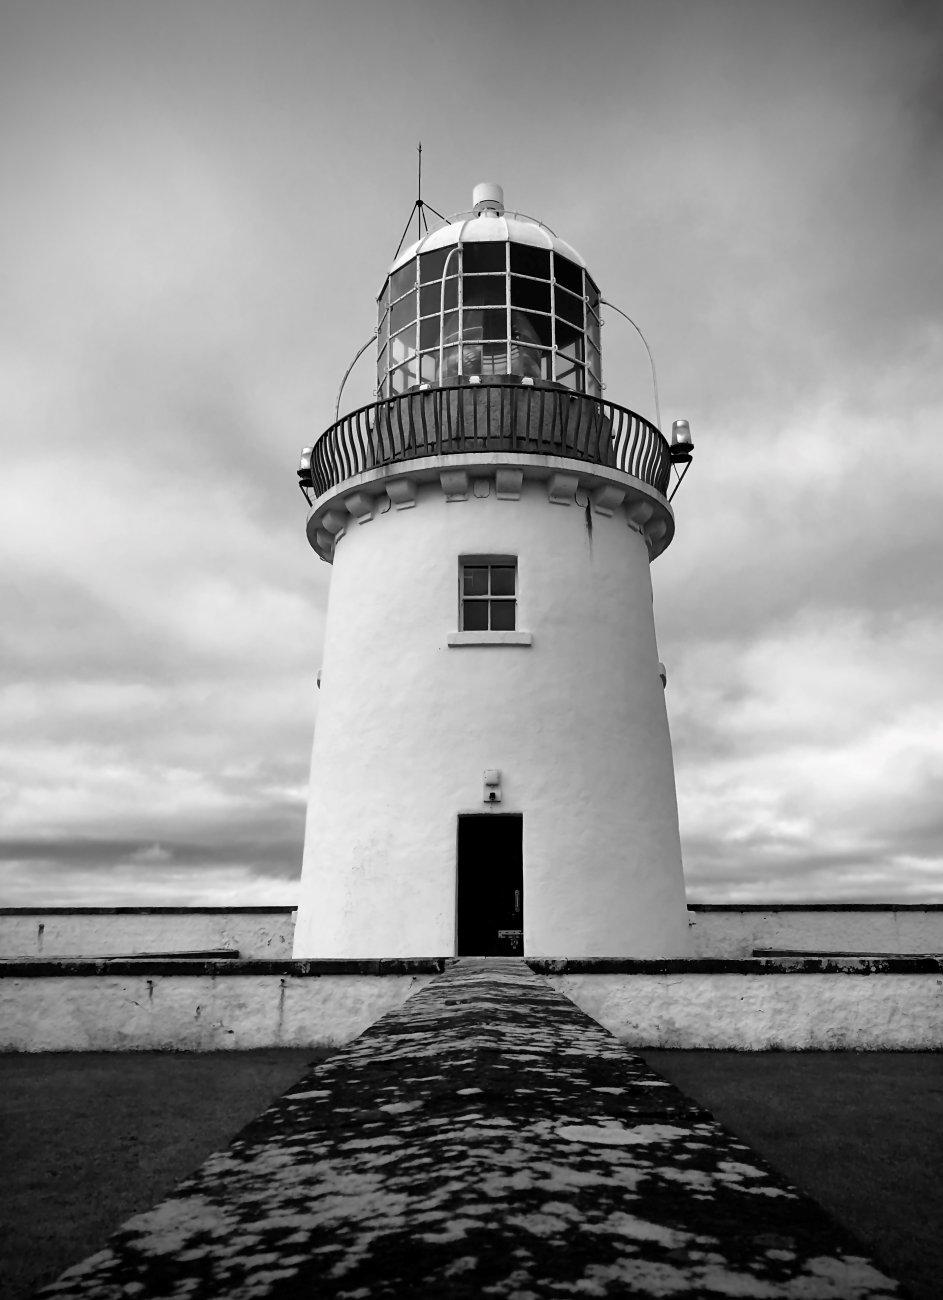 St John's Lighthouse, Dunkineely.